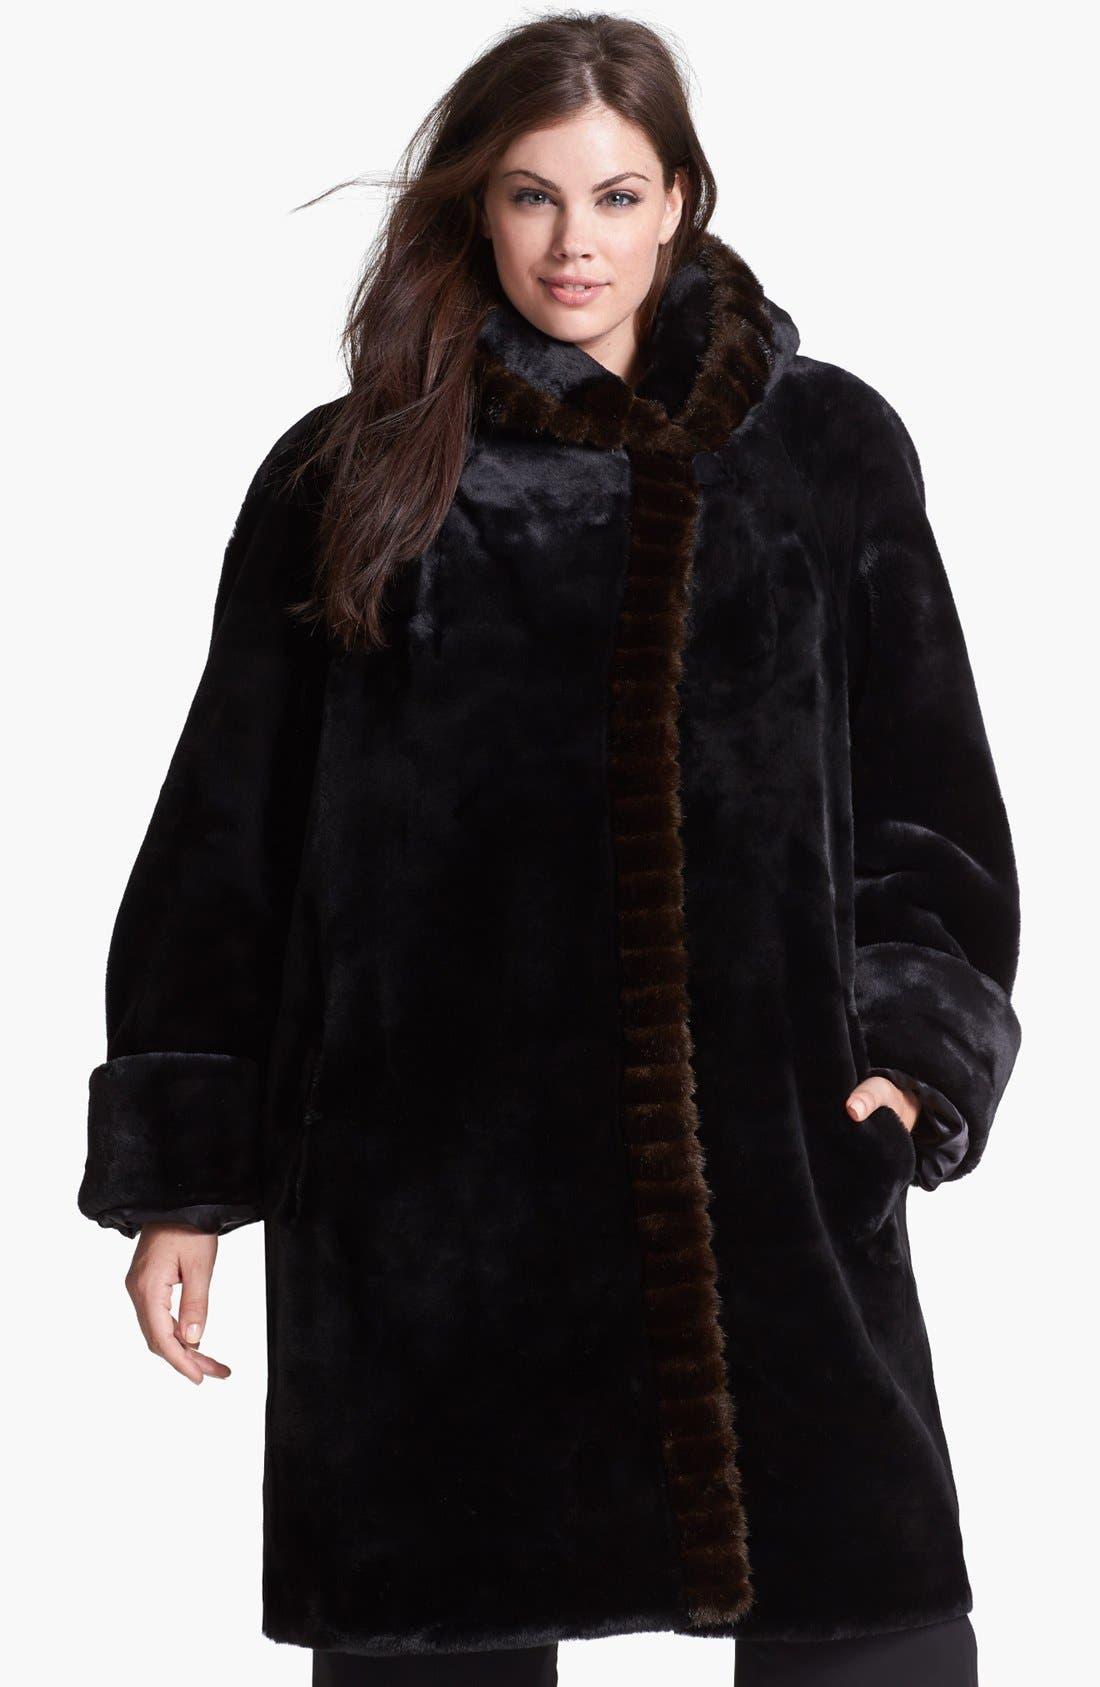 Alternate Image 1 Selected - Gallery Hooded Faux Fur Walking Coat (Plus Size)